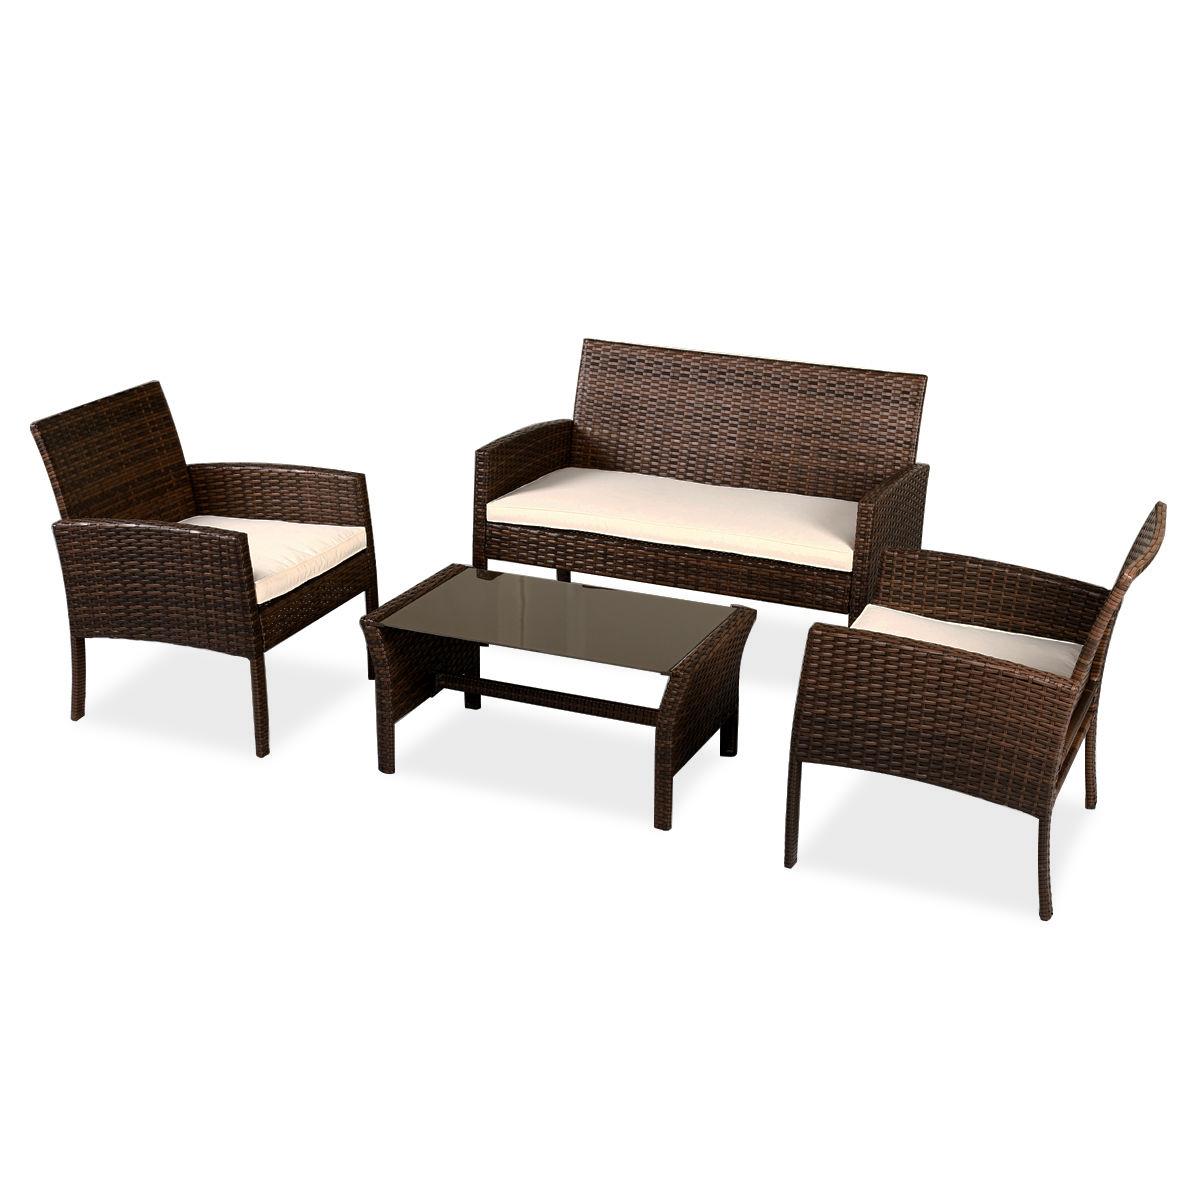 4 pcs Patio Garden Furniture Wicker Rattan Sofa Set